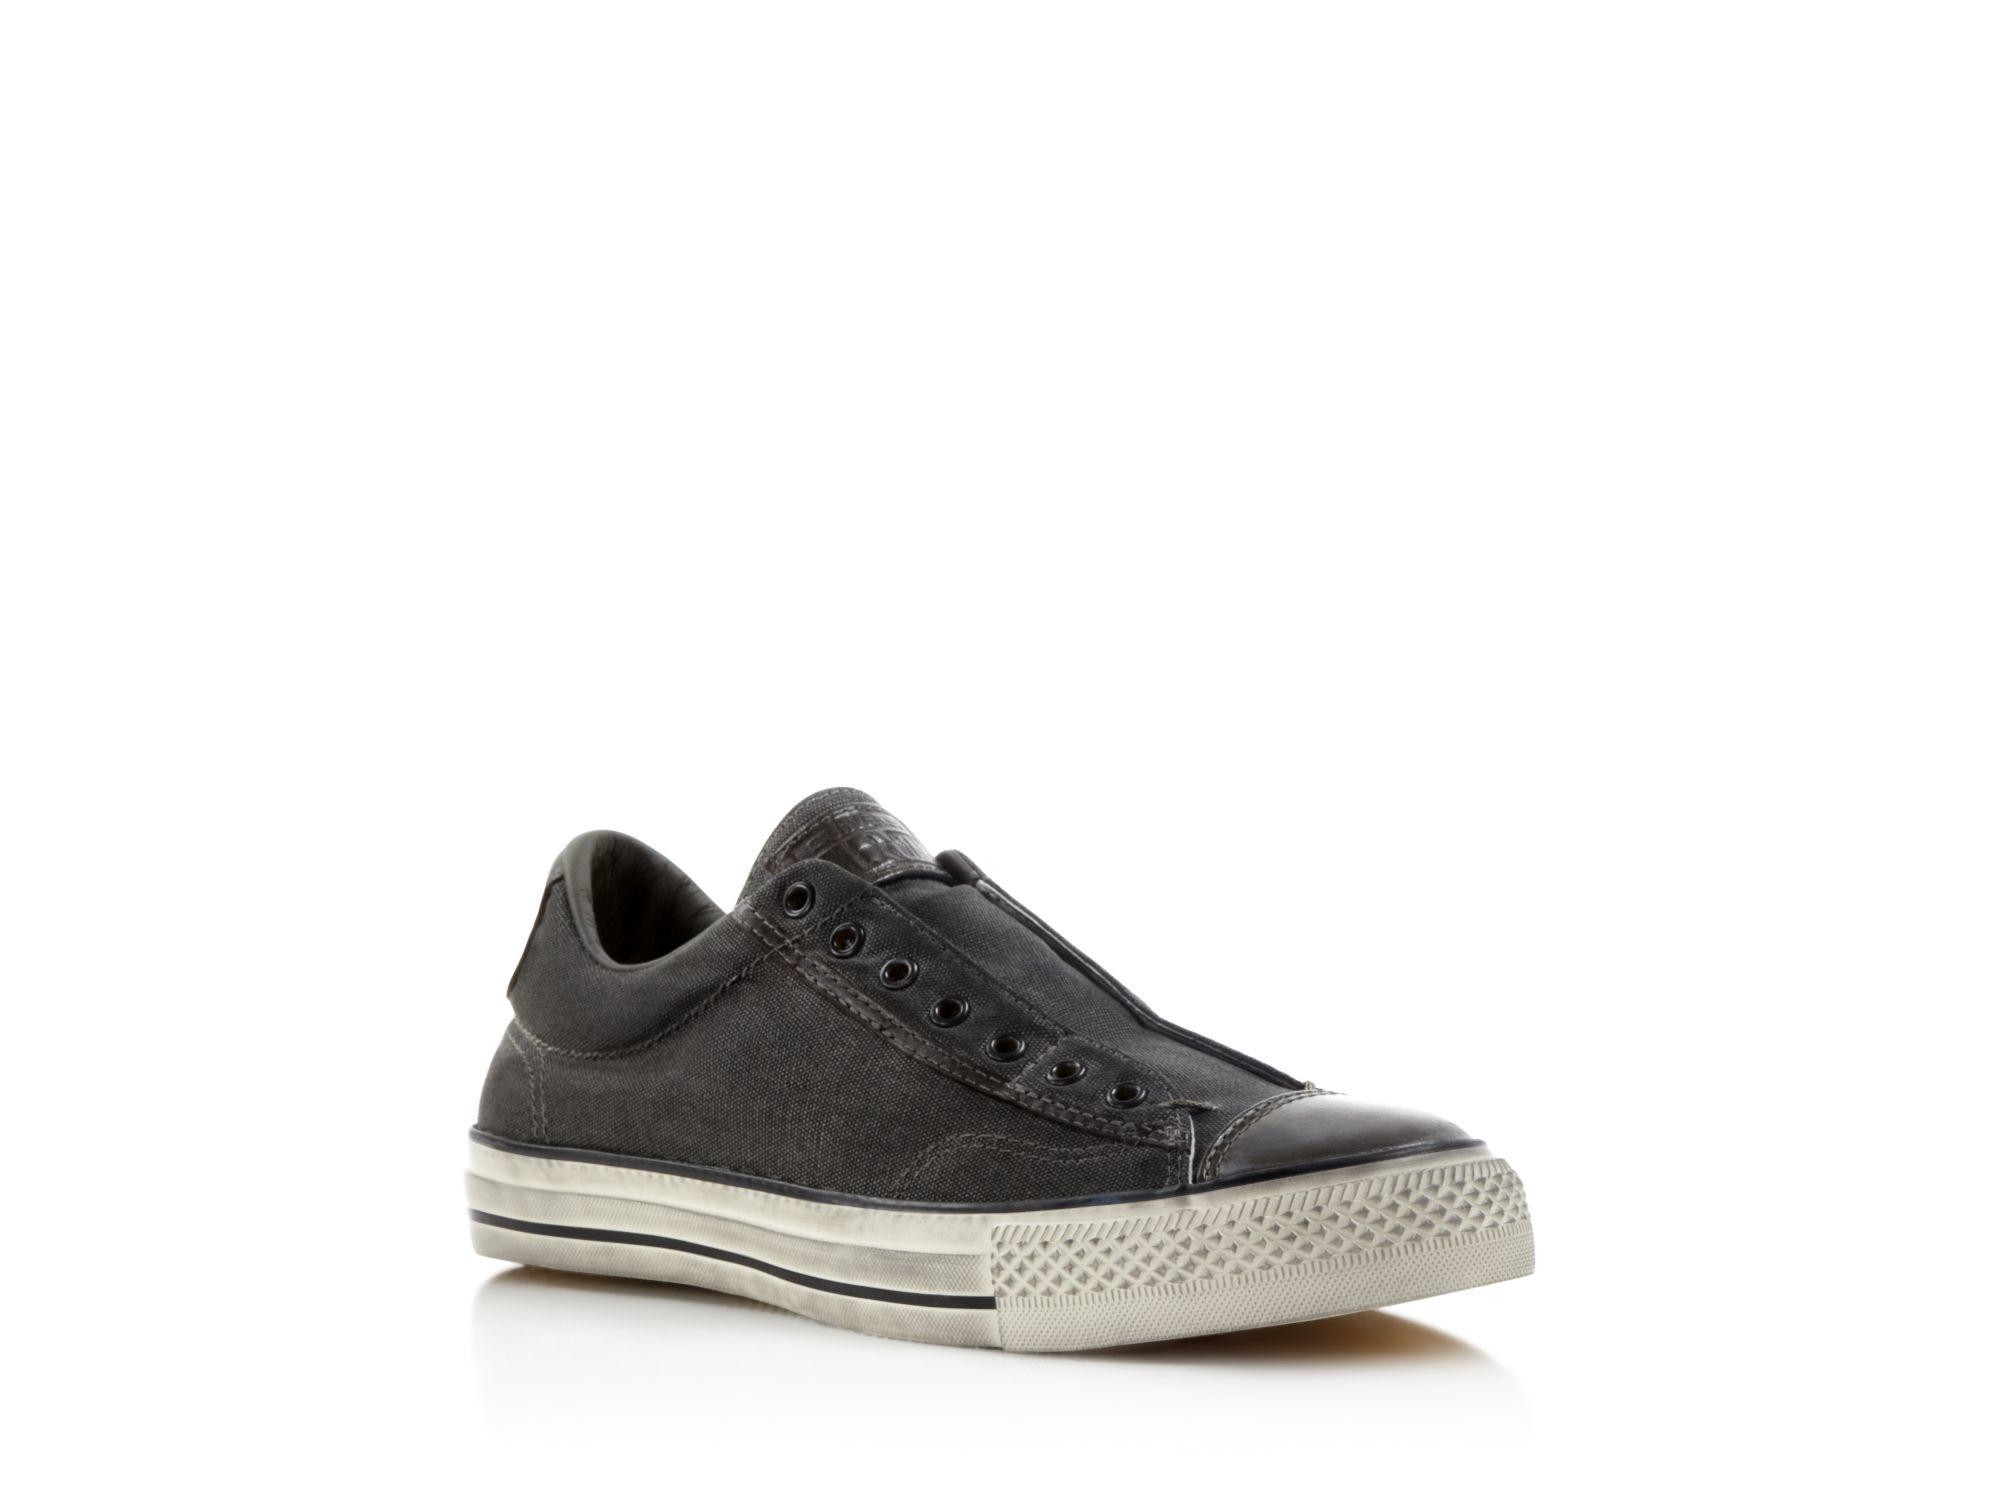 85b1e4794e48fe Converse All Star Vintage Slip On Sneakers in Gray for Men .